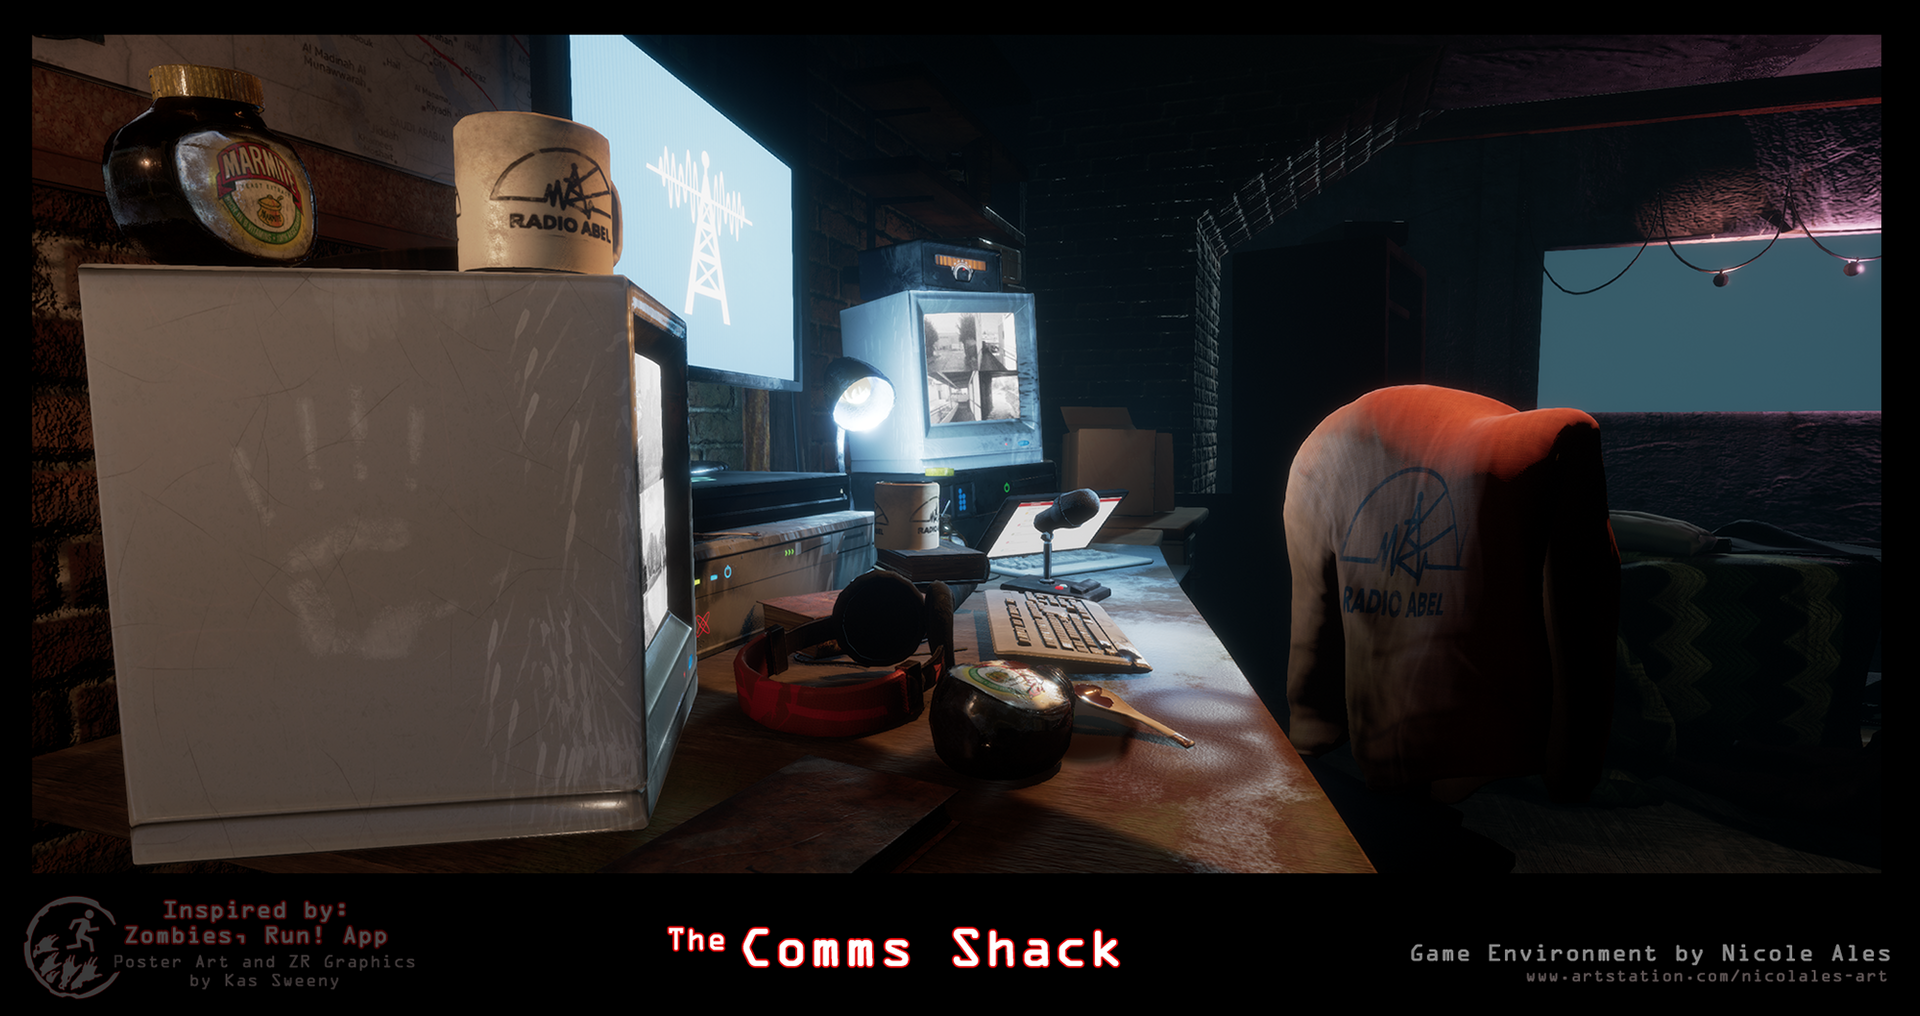 CommsShack_gameEnvironment_nicoleAles_01.png